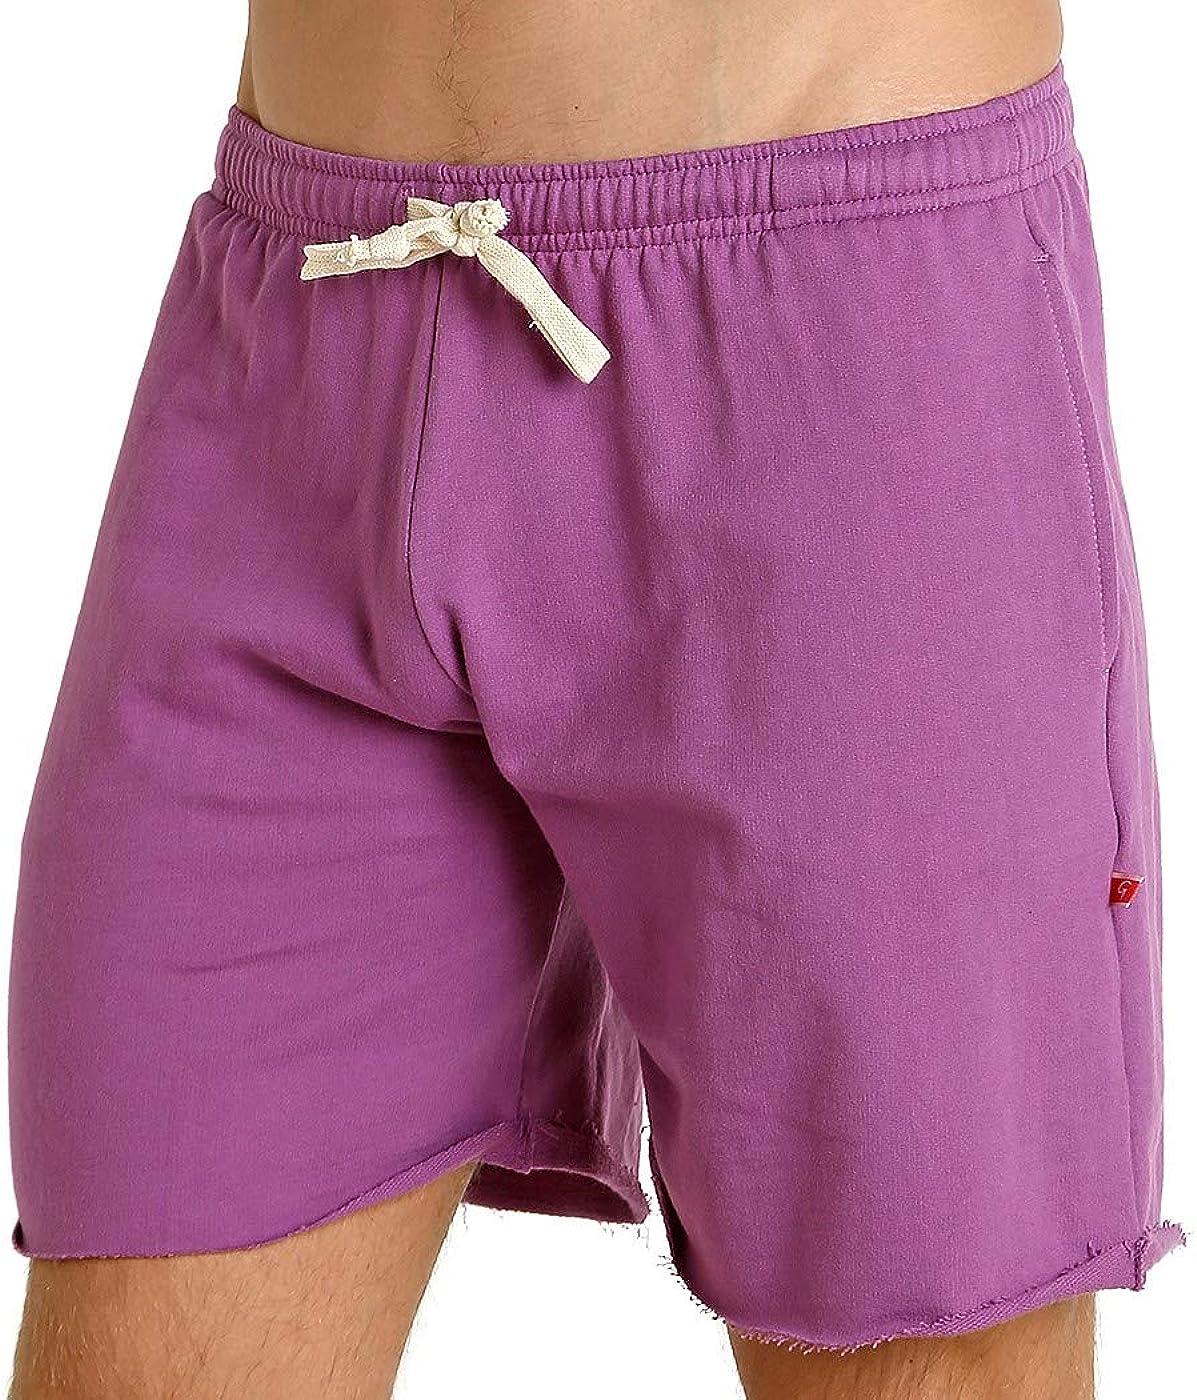 Go Softwear West Coast Vibe Warm-Up Short Plum